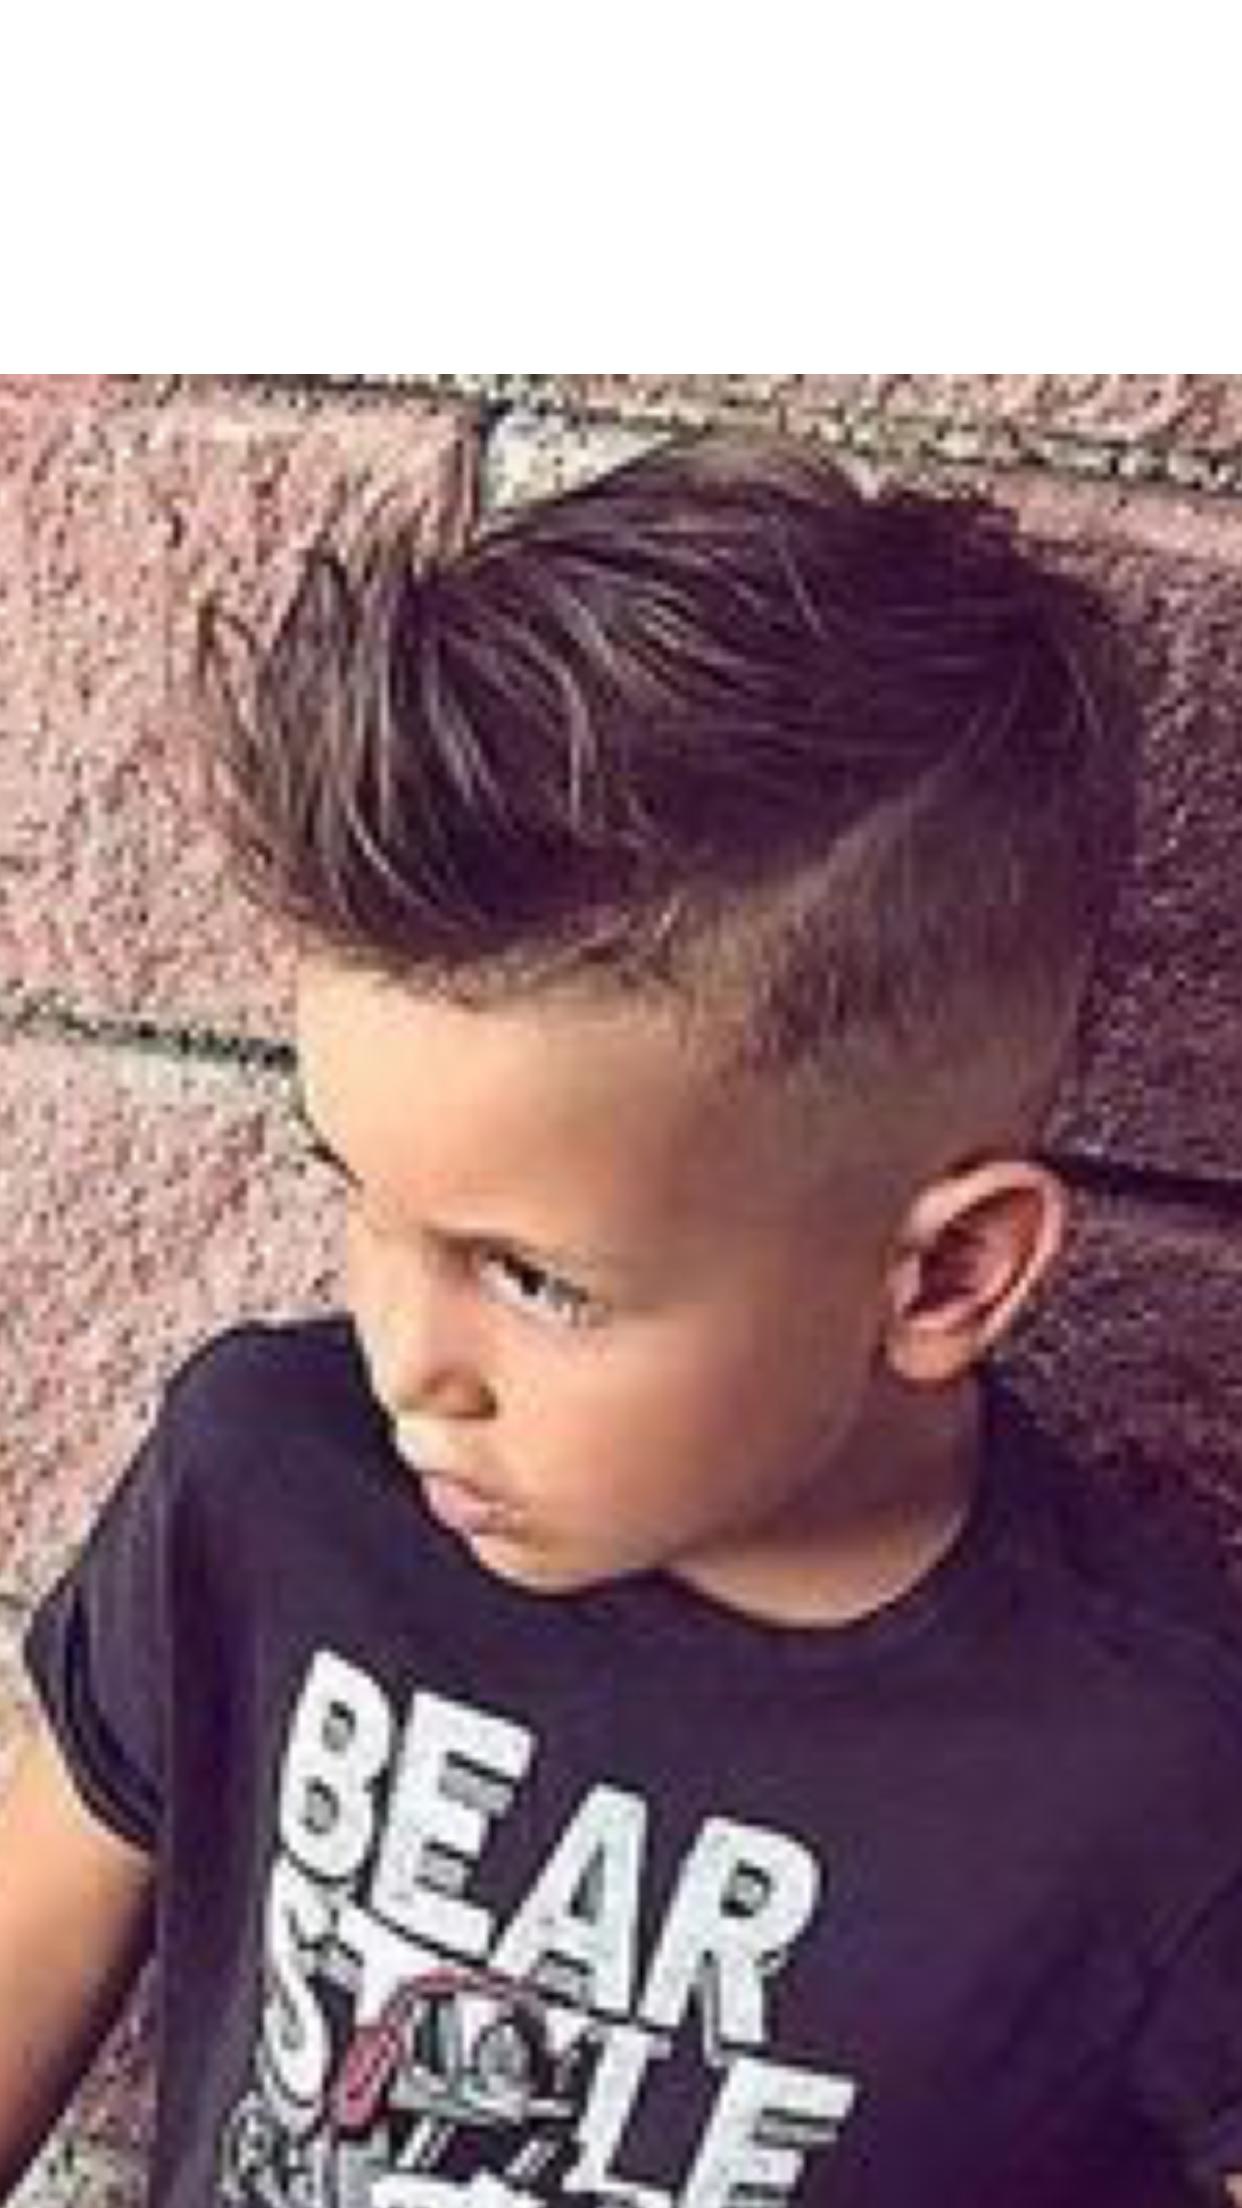 Pin By Alaina Burr On Hair Styles Boy Hairstyles Boys Haircuts Little Boy Hairstyles